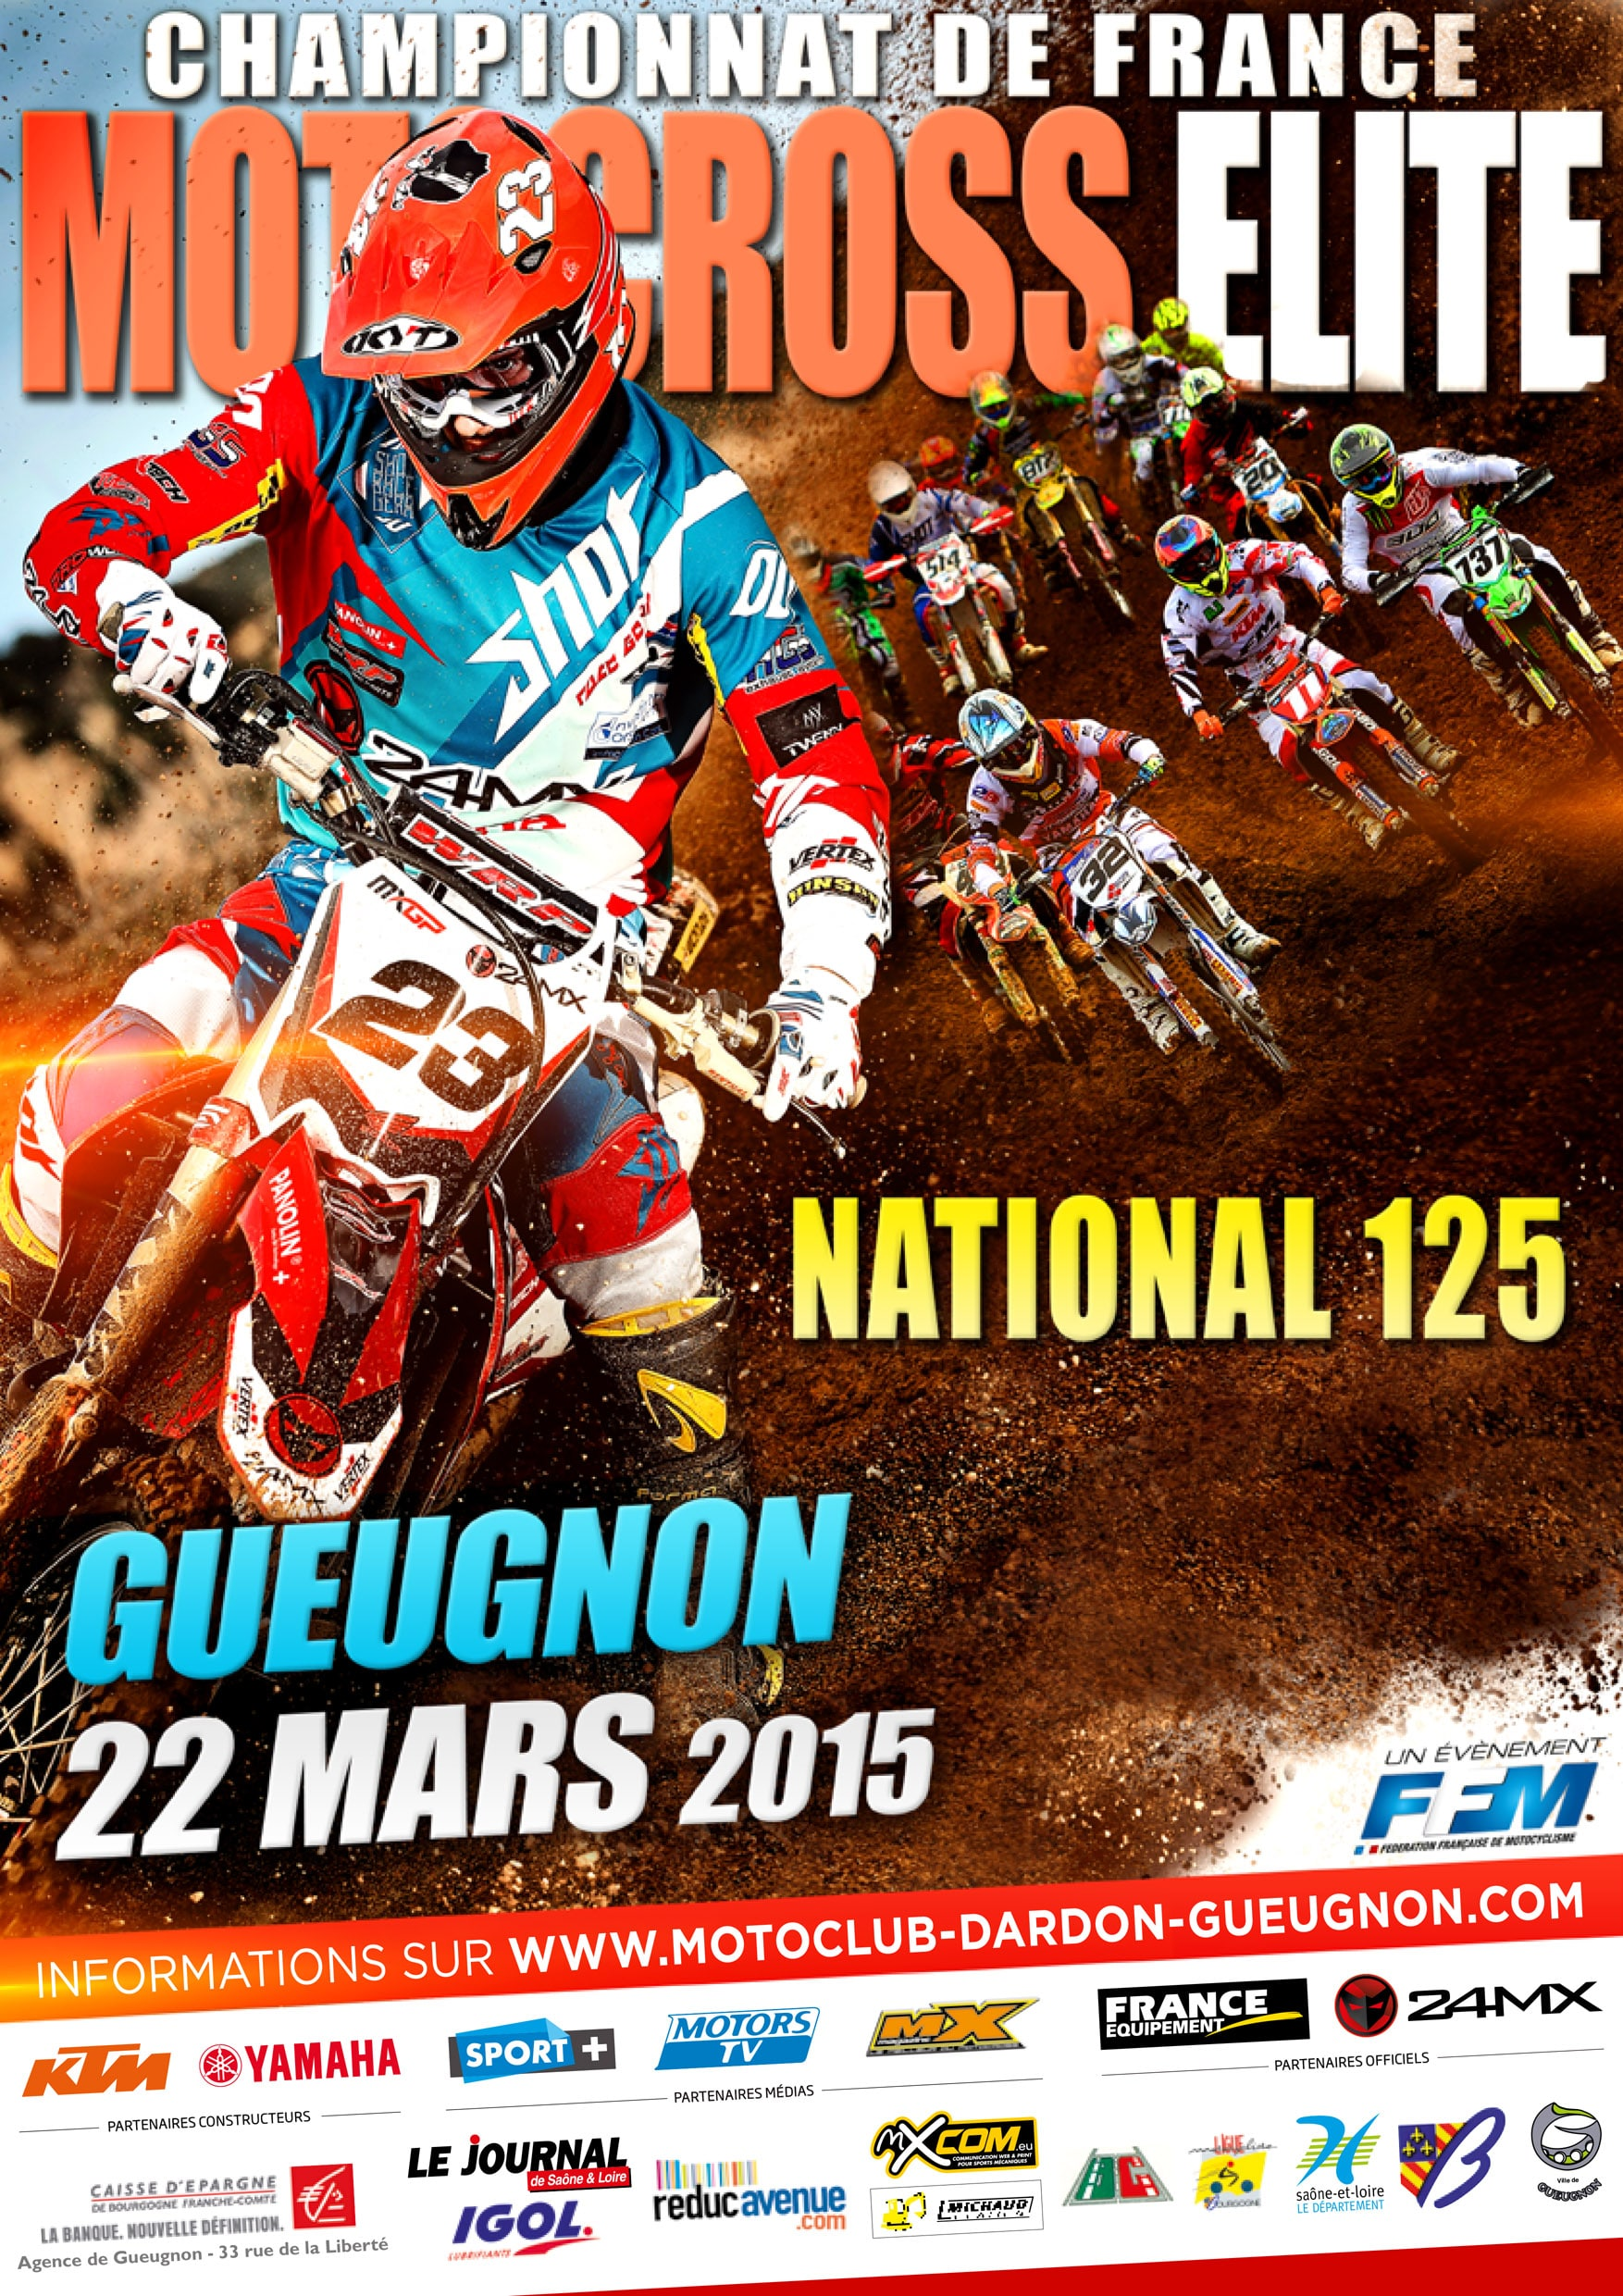 affiche motocross elite 2015 dardon gueugnon